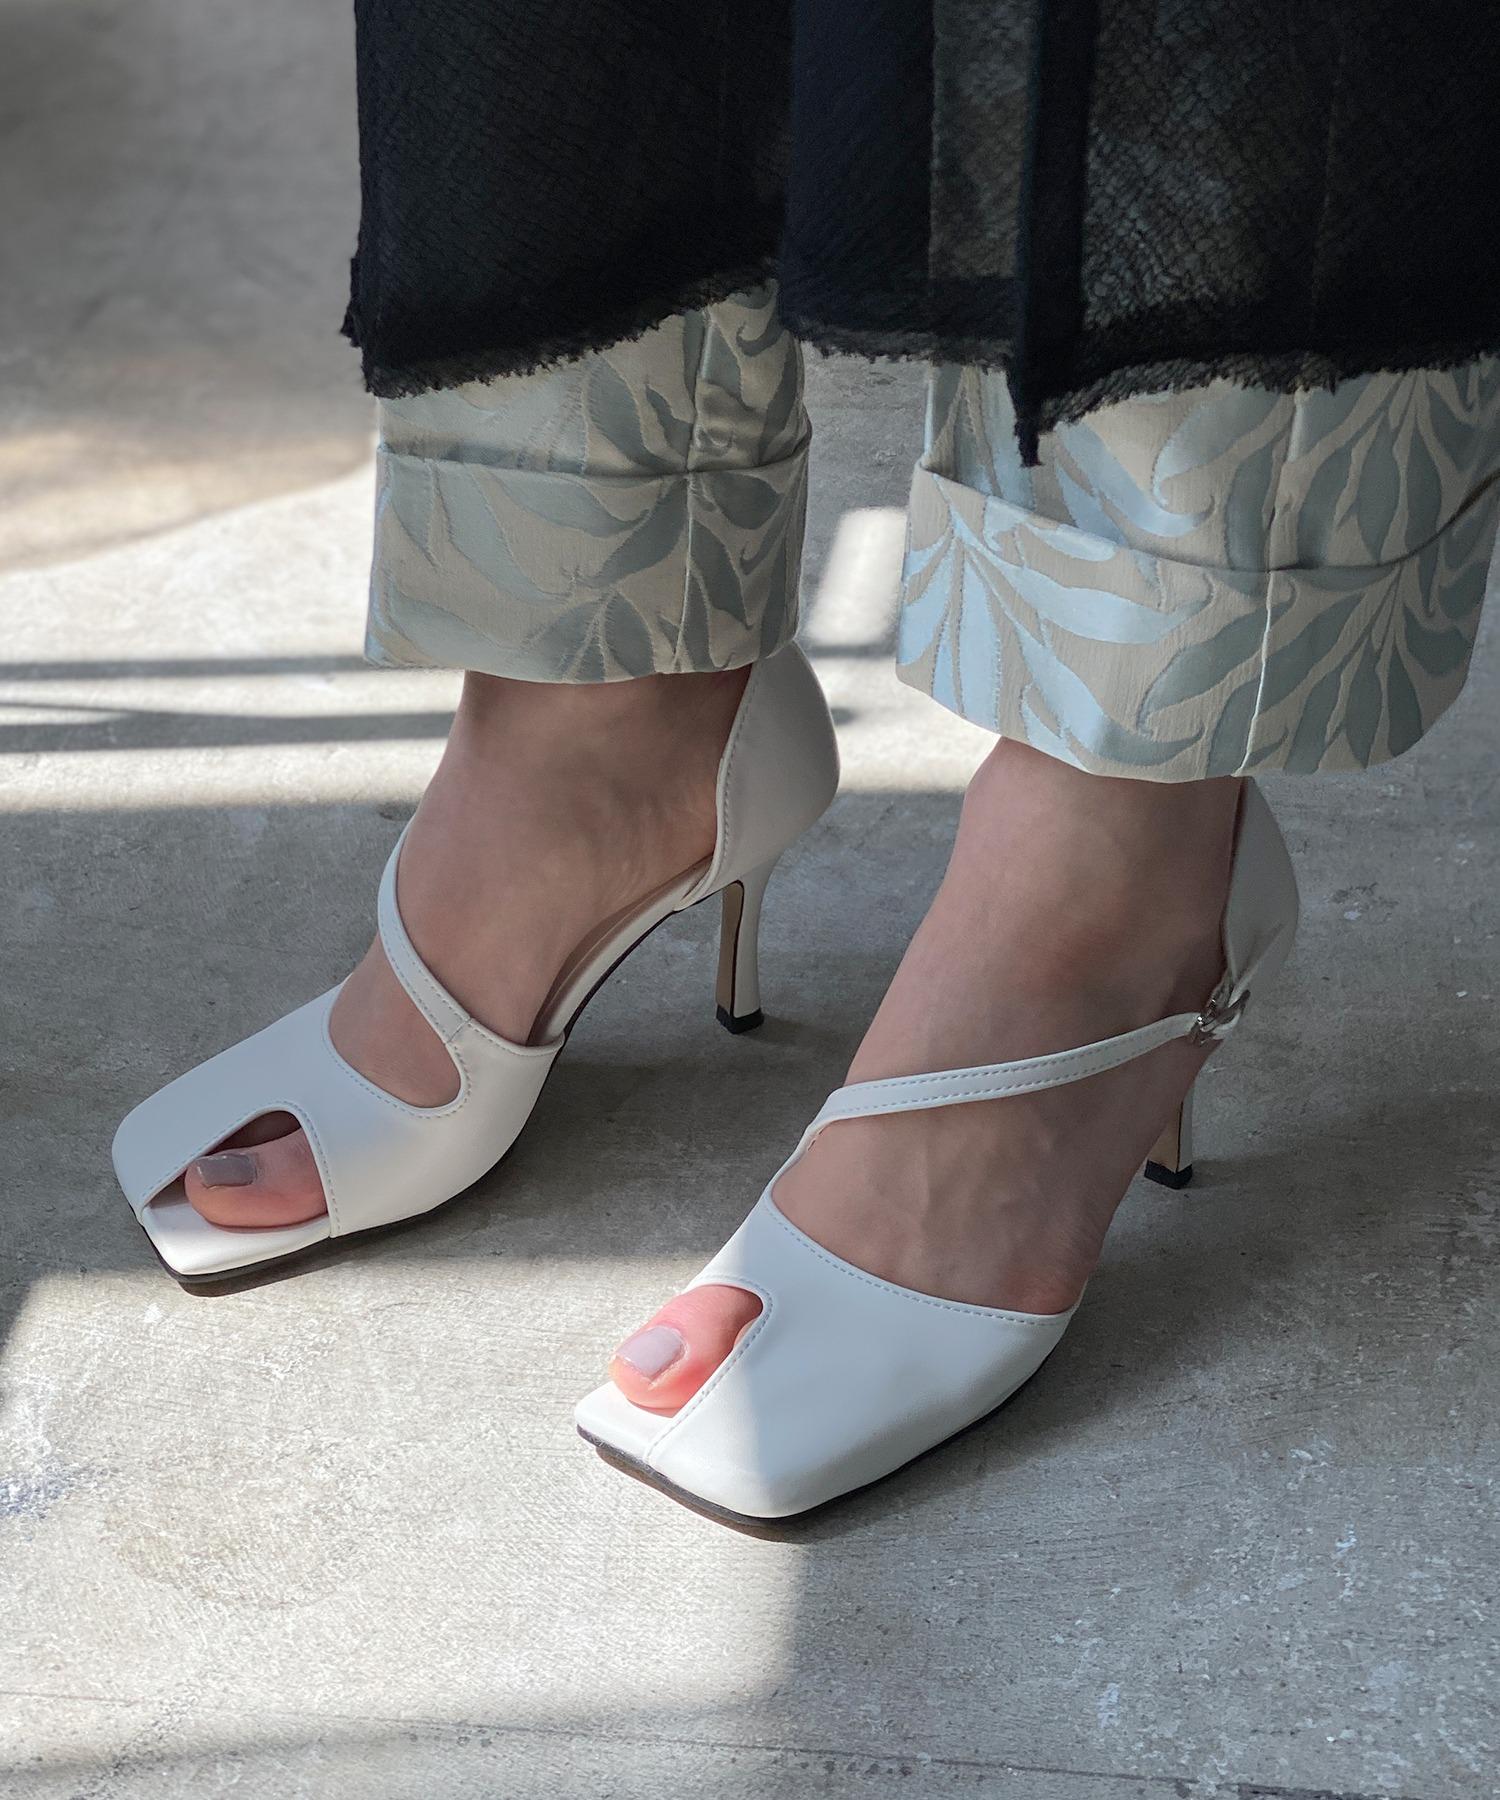 【chuclla】【2021/SS】Asymmetry cutting-toe pumps chs143